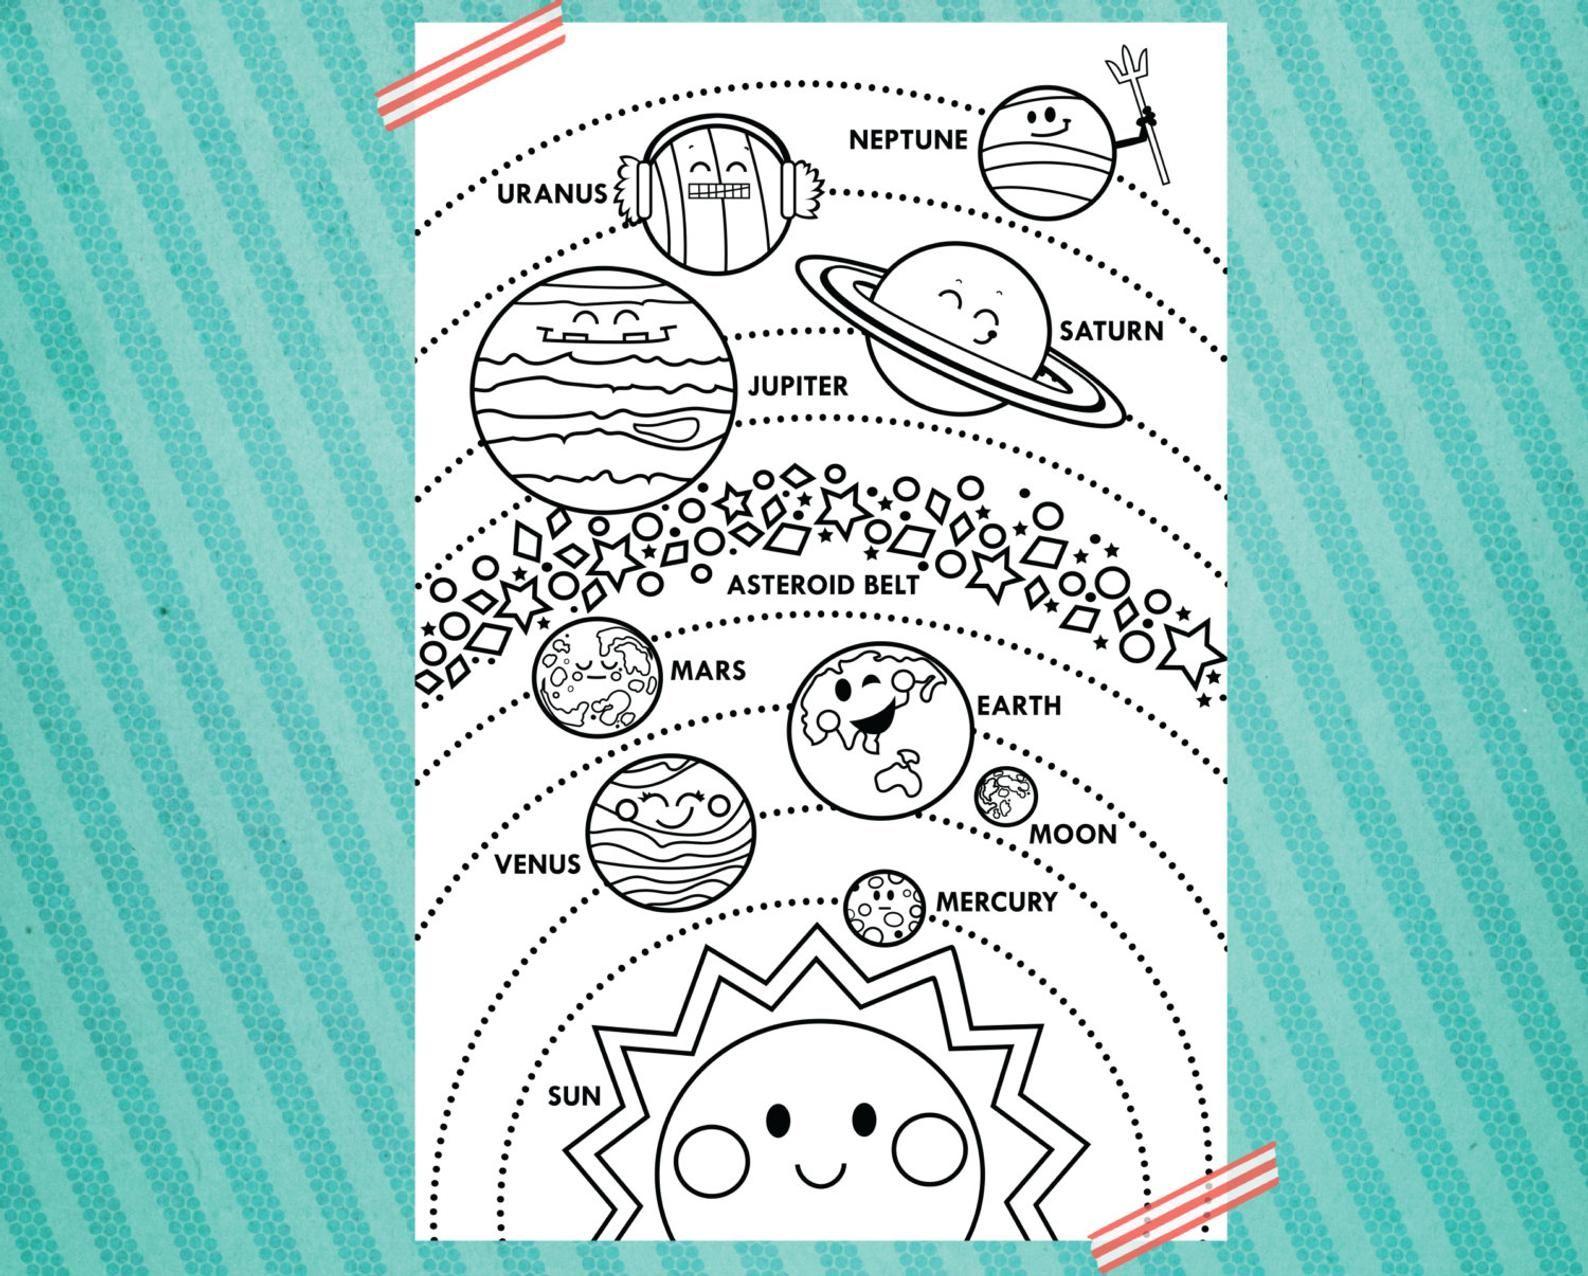 Solar System Printable 24x36 Vertical Layout Etsy Solar System Crafts Solar System Solar System Activities